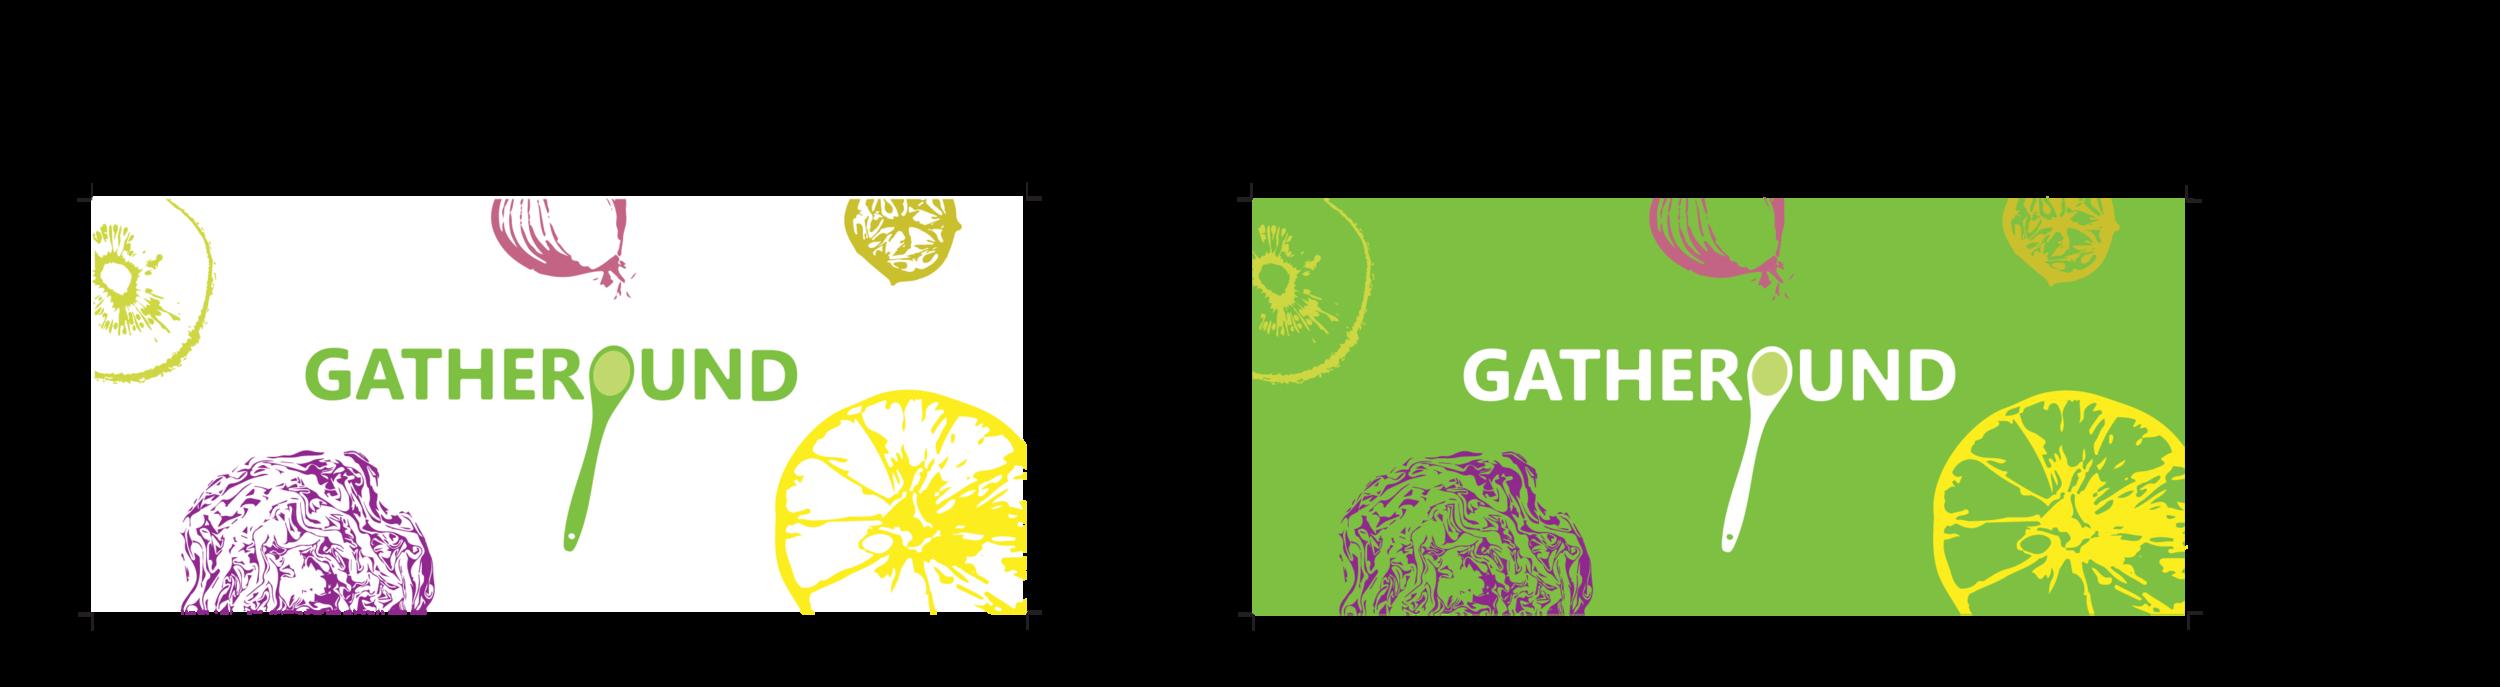 gatheround web-17.png